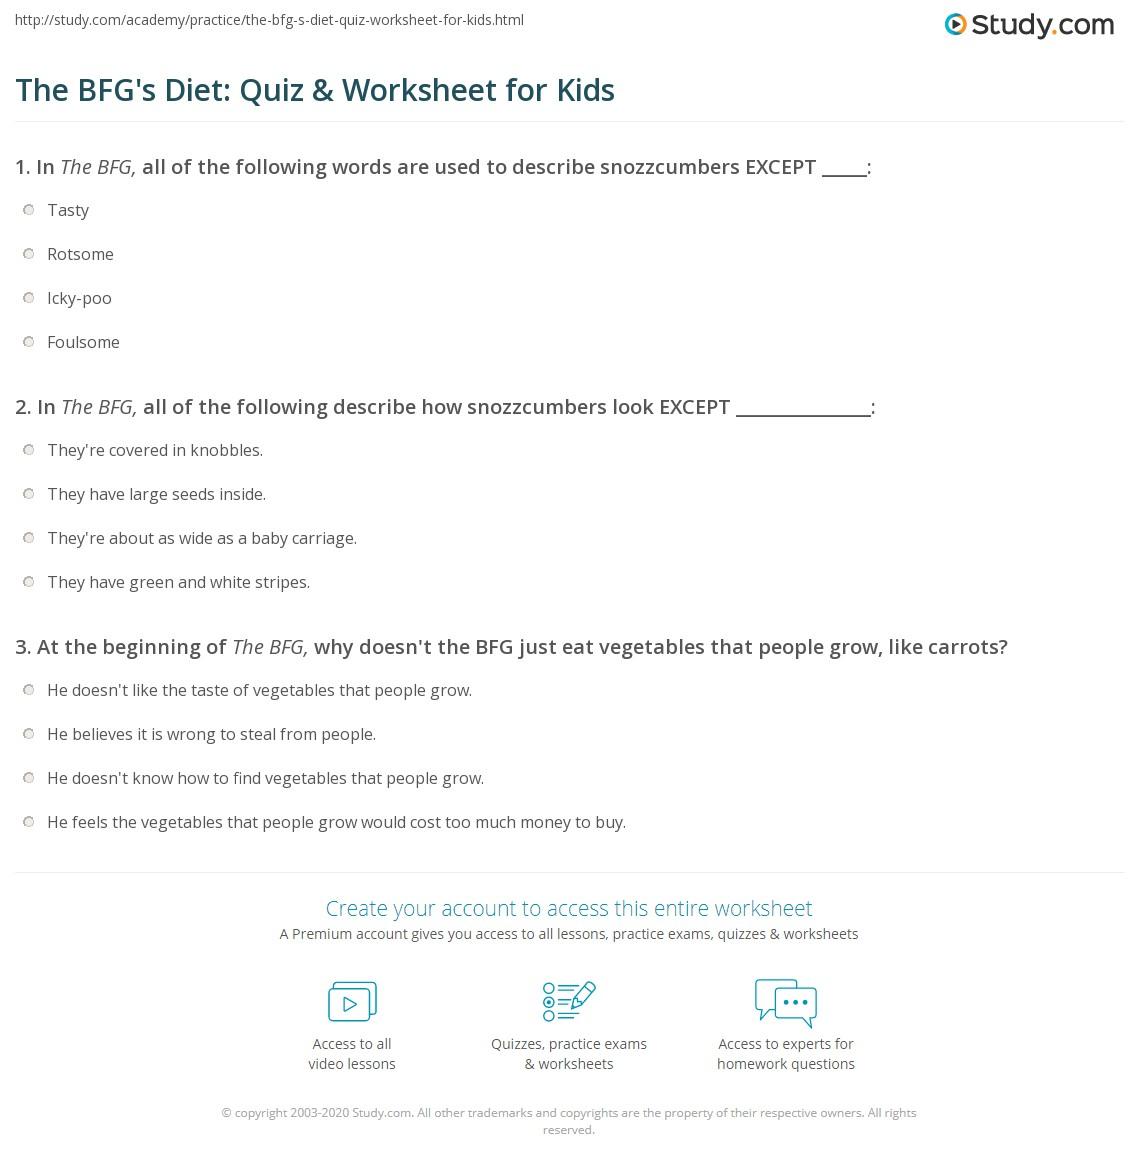 The Bfg St Quiz Amp Worksheet For Kids